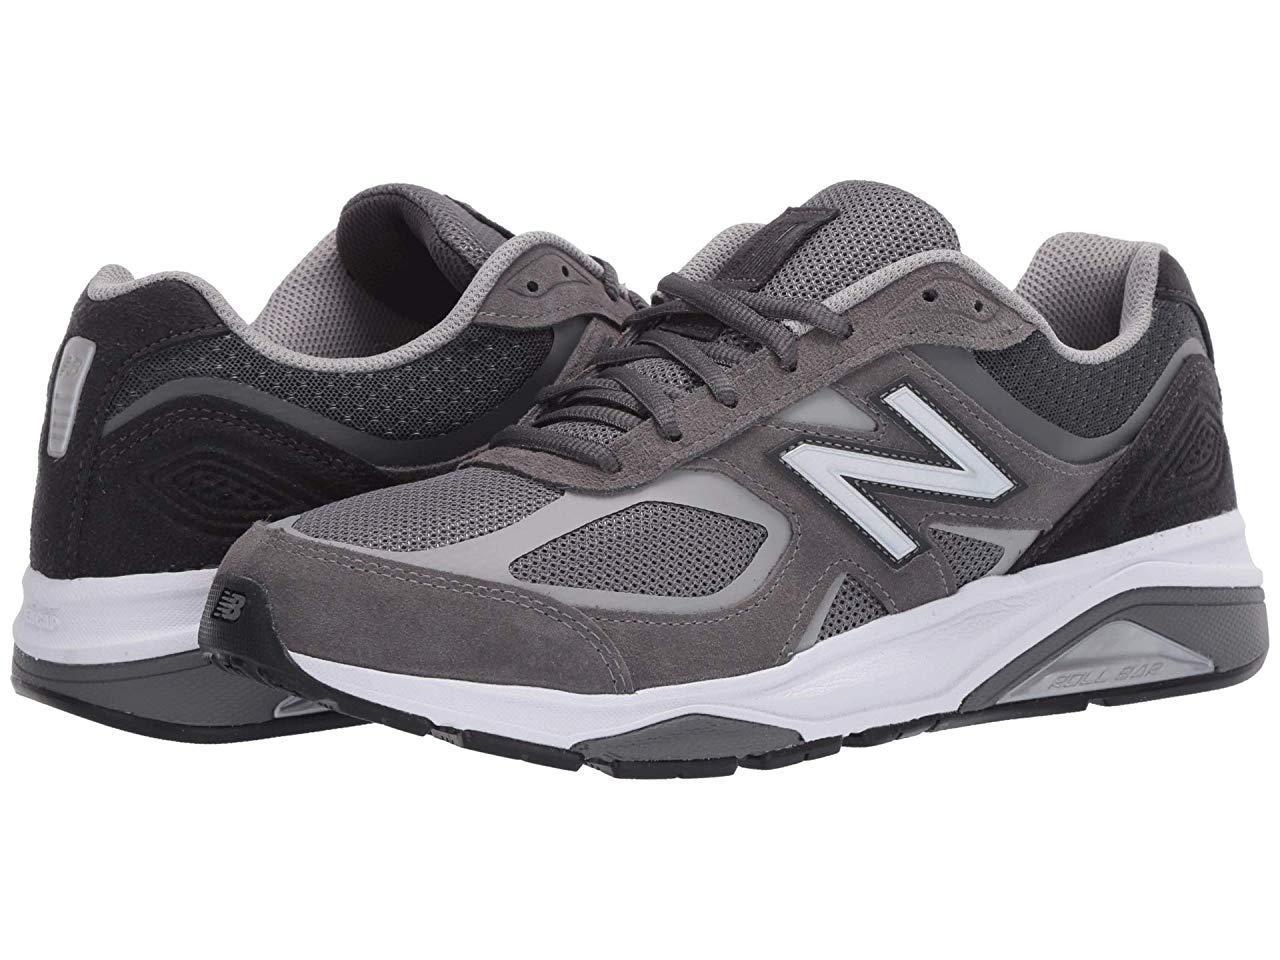 Кроссовки/Кеды New Balance 1540v3 Grey/Black